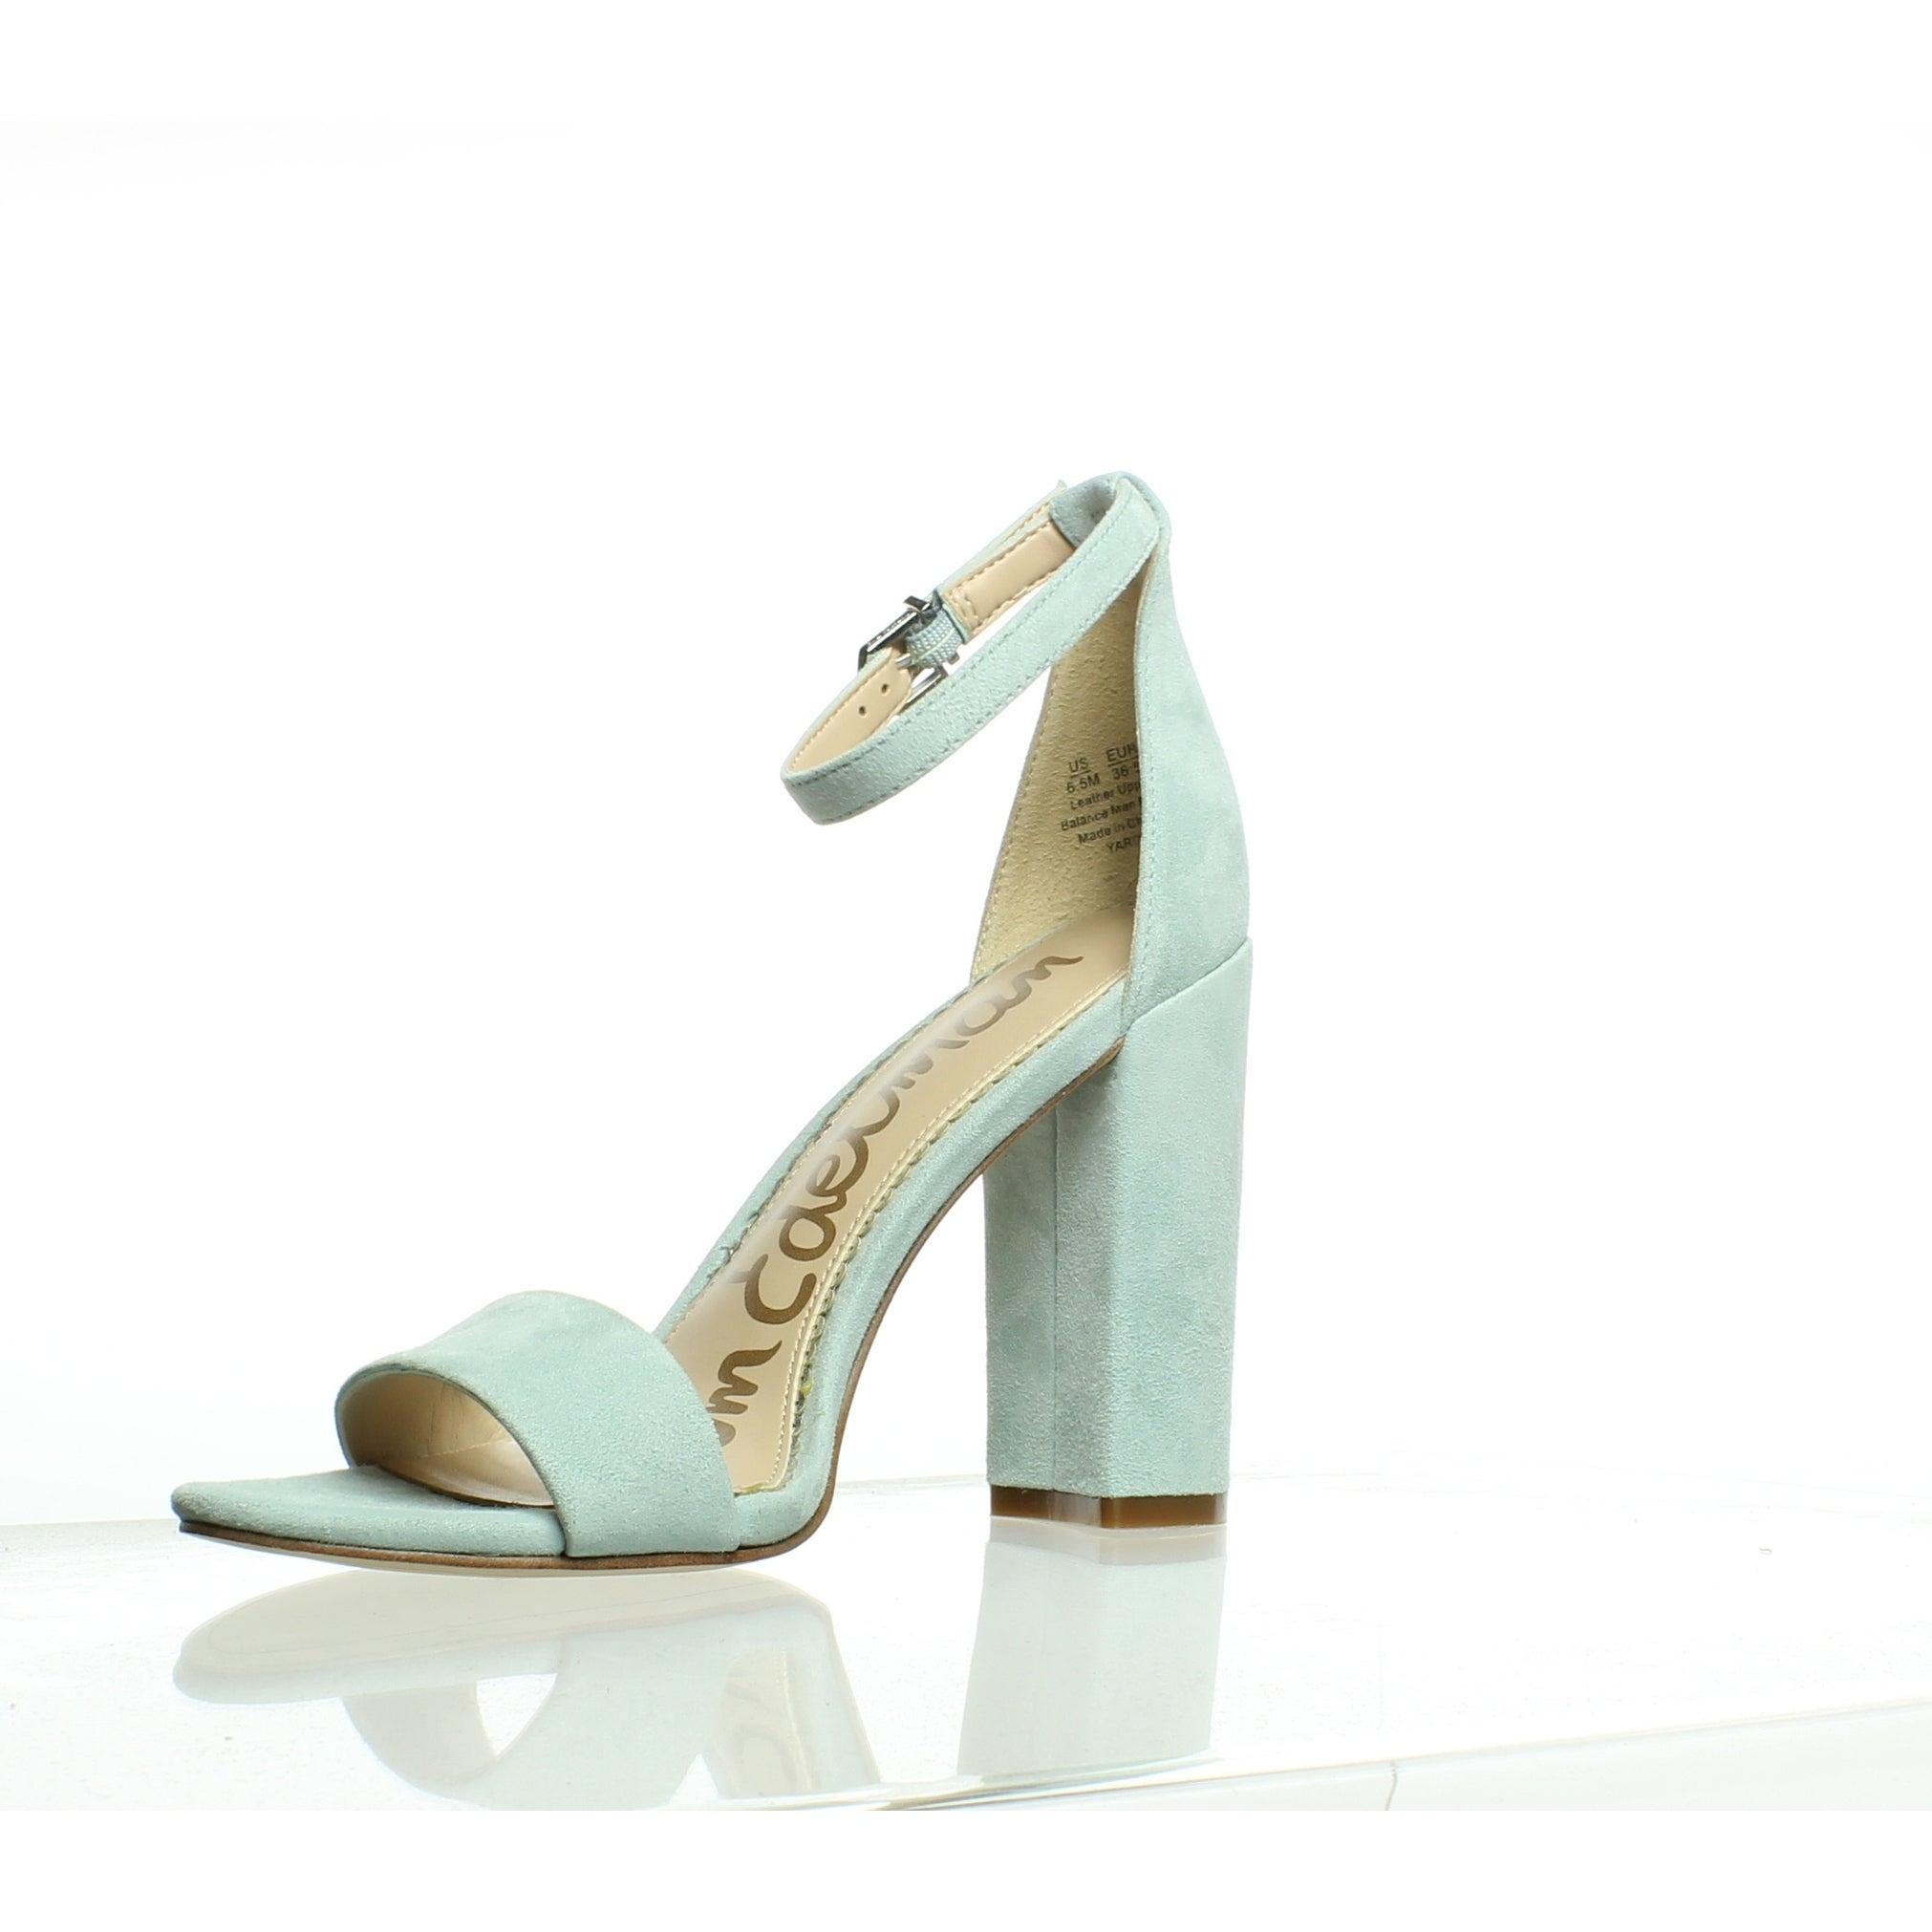 9d53bd3b4 Shop Sam Edelman Womens Yaro Amalfi Blue Ankle Strap Heels Size 6.5 - Free  Shipping Today - Overstock - 27799375